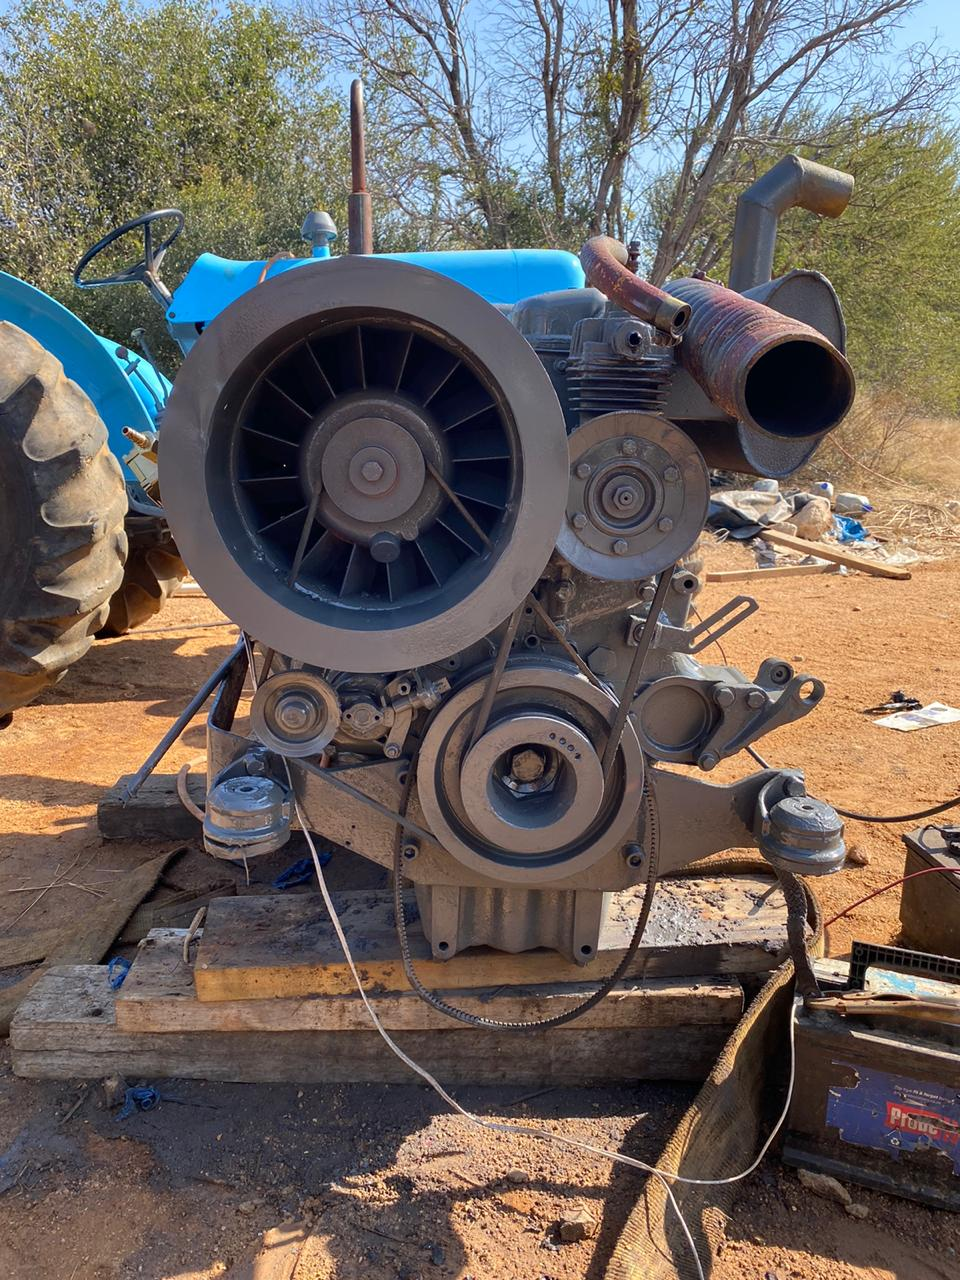 Deutz 6413 L 6 cylinder engin with hydrualic pump